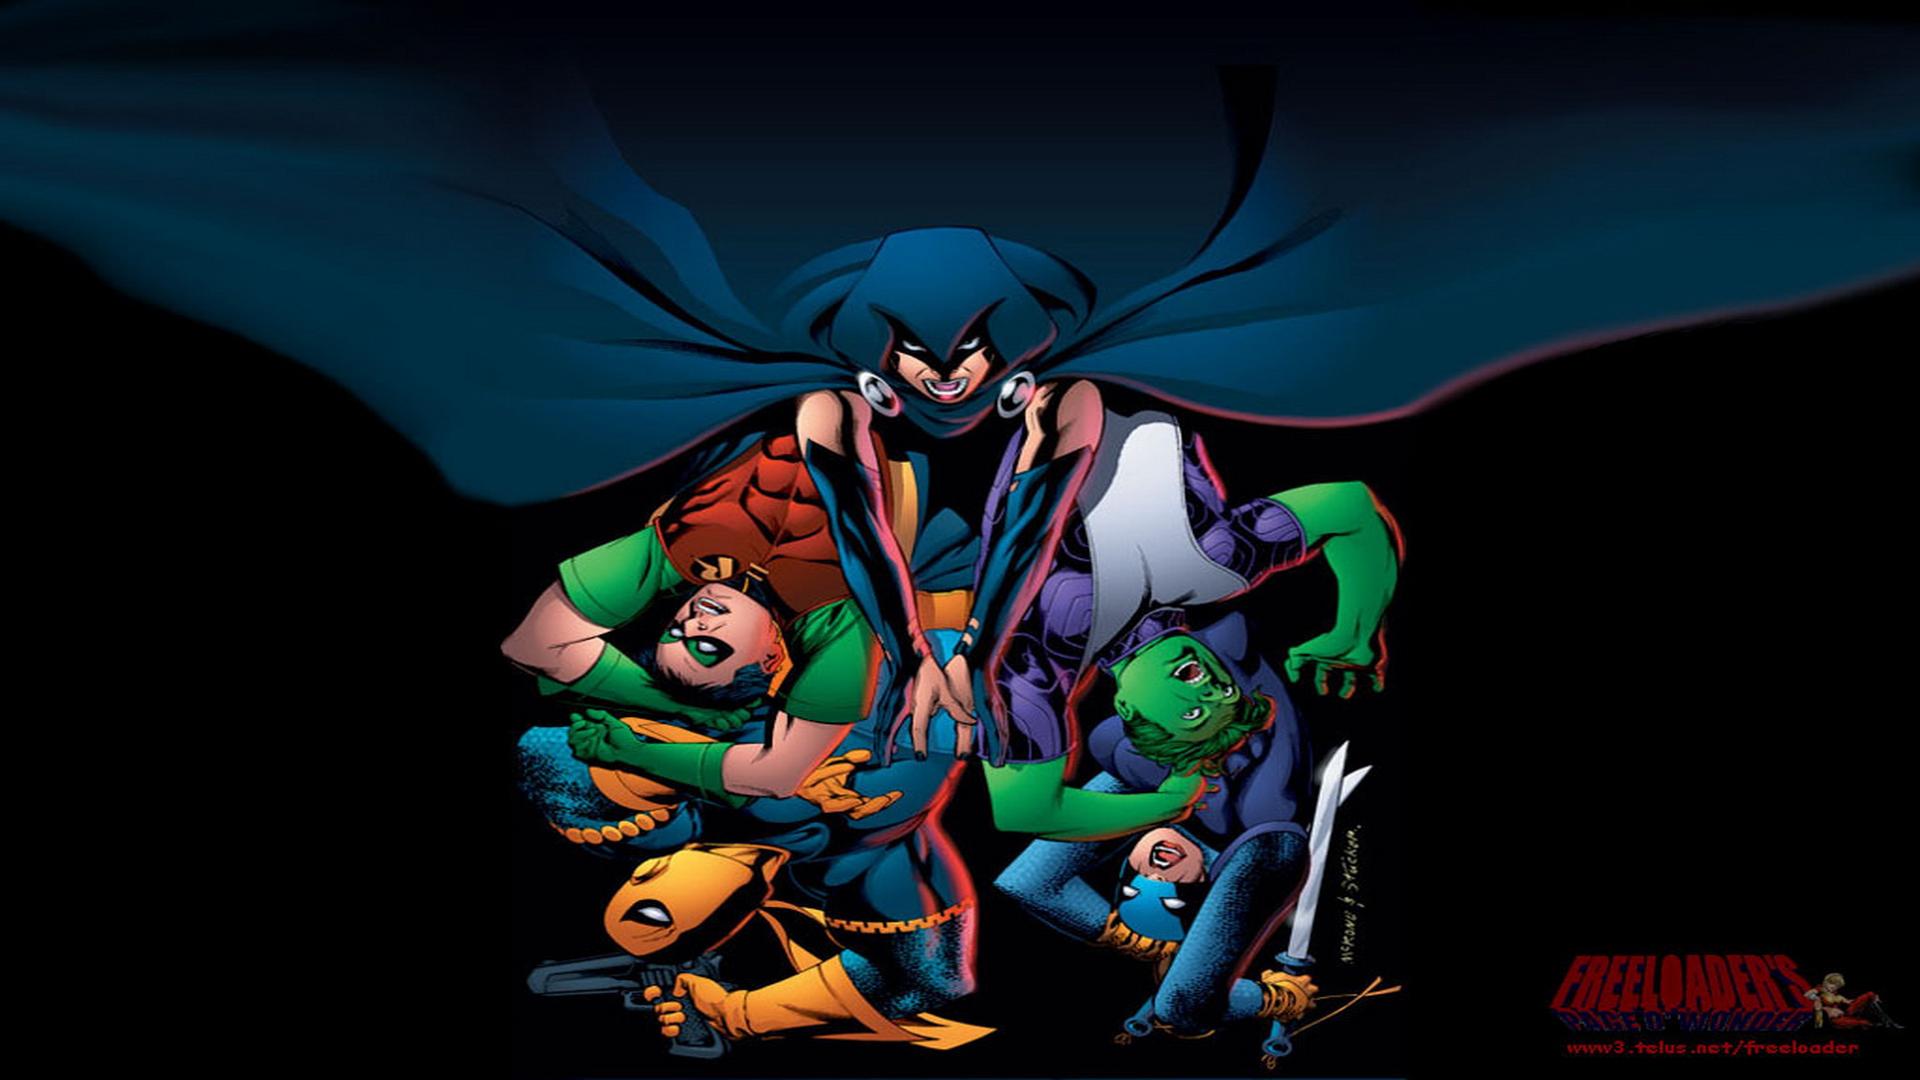 [41+] Teen Titans Wallpaper HD on WallpaperSafari